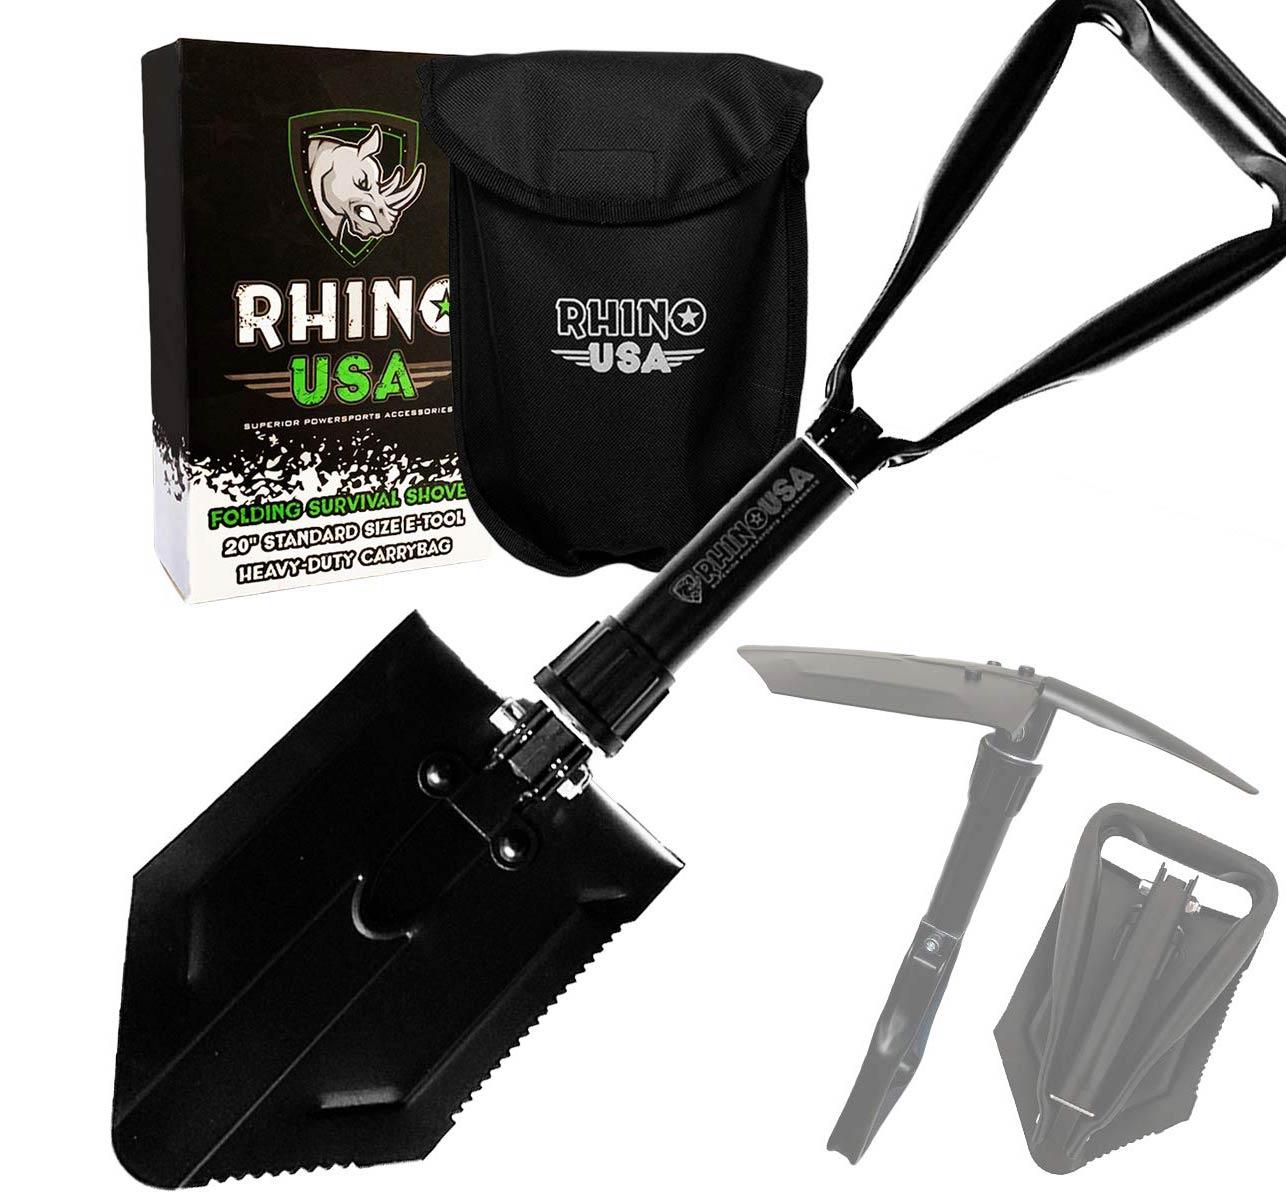 rhino usa folding survival shovel